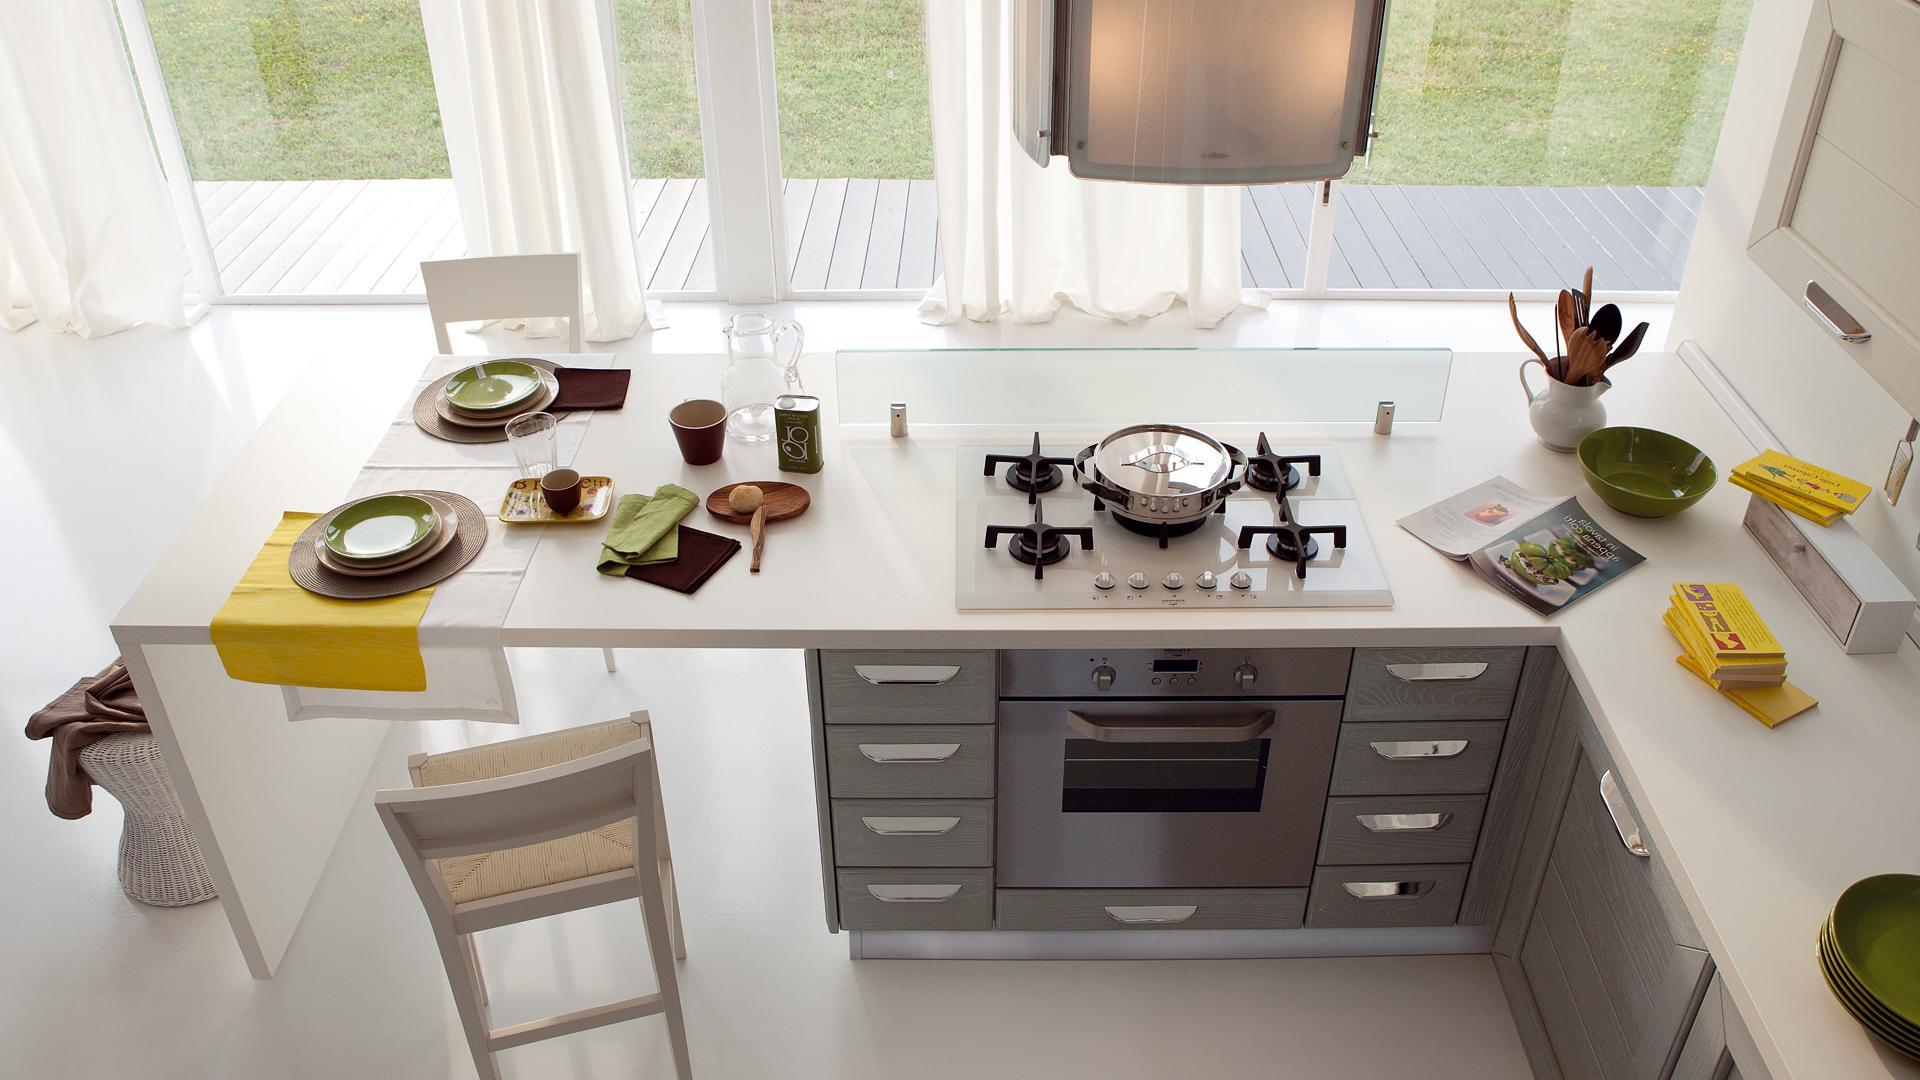 cucina-contemporanea-classica-claudia-lube-2 - Rafaschieri Arredamenti